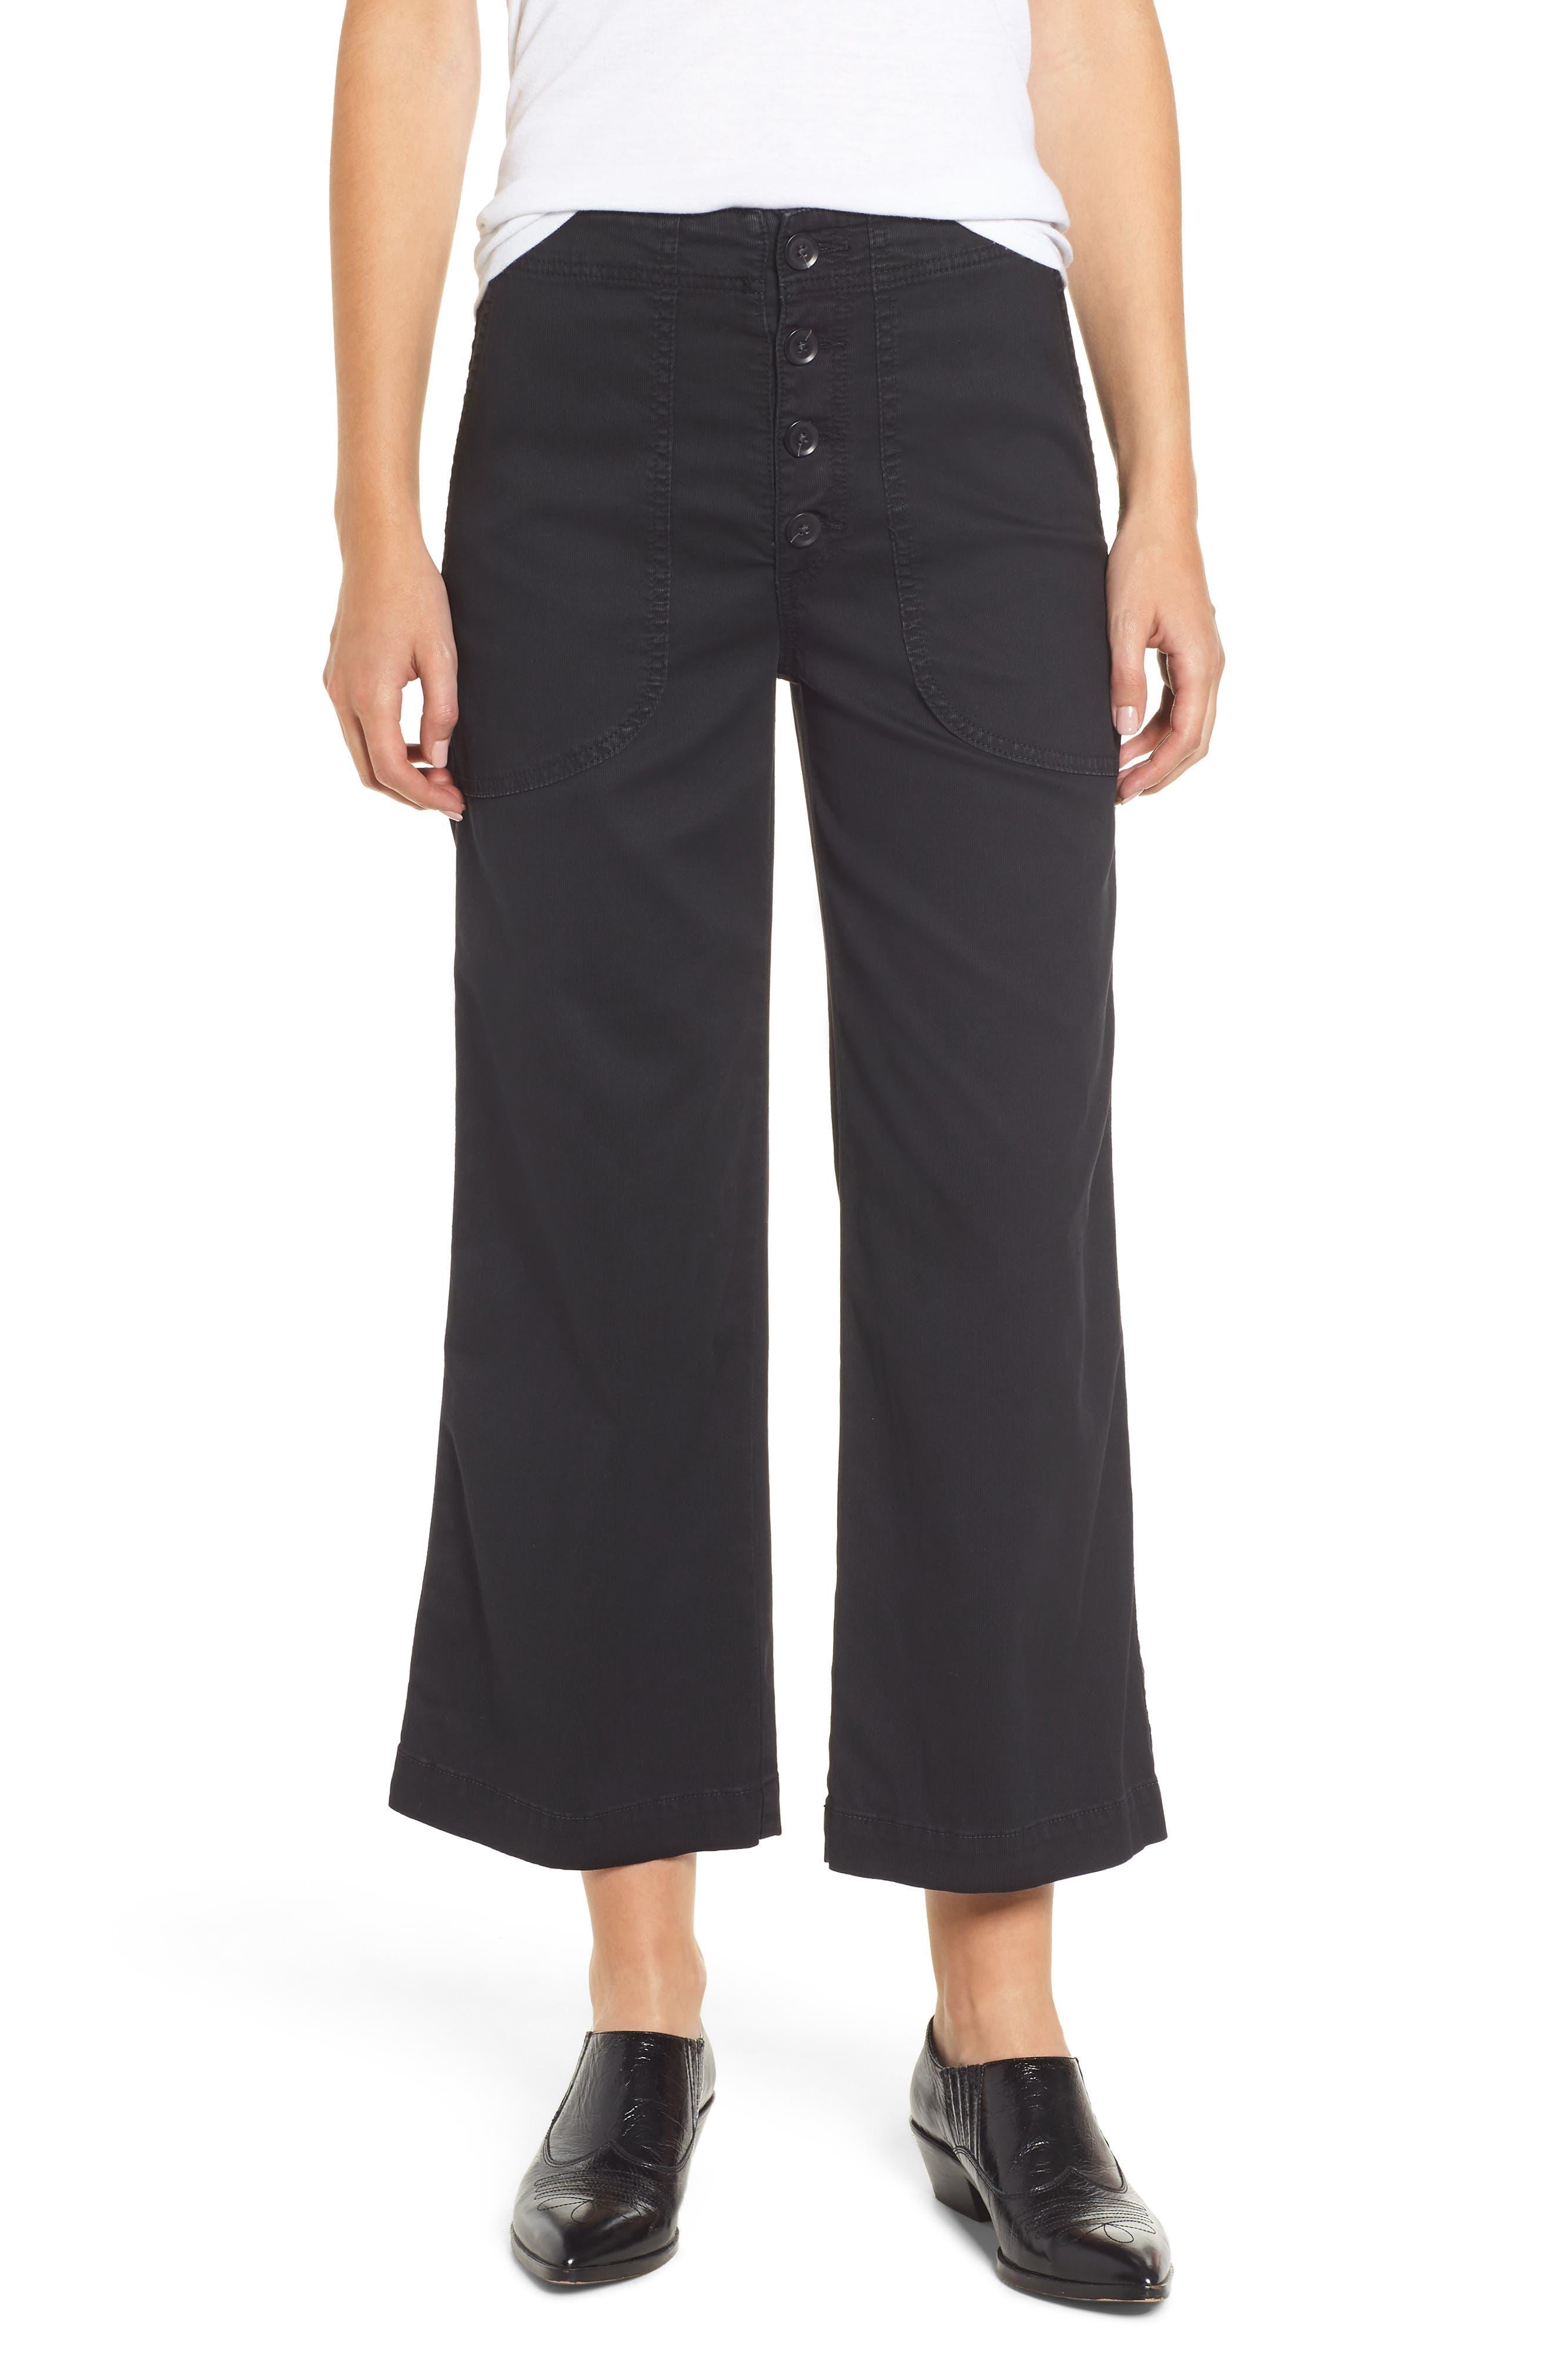 Etta High Waist Crop Wide Leg Jeans,                         Main,                         color, SULFUR SUPER BLACK